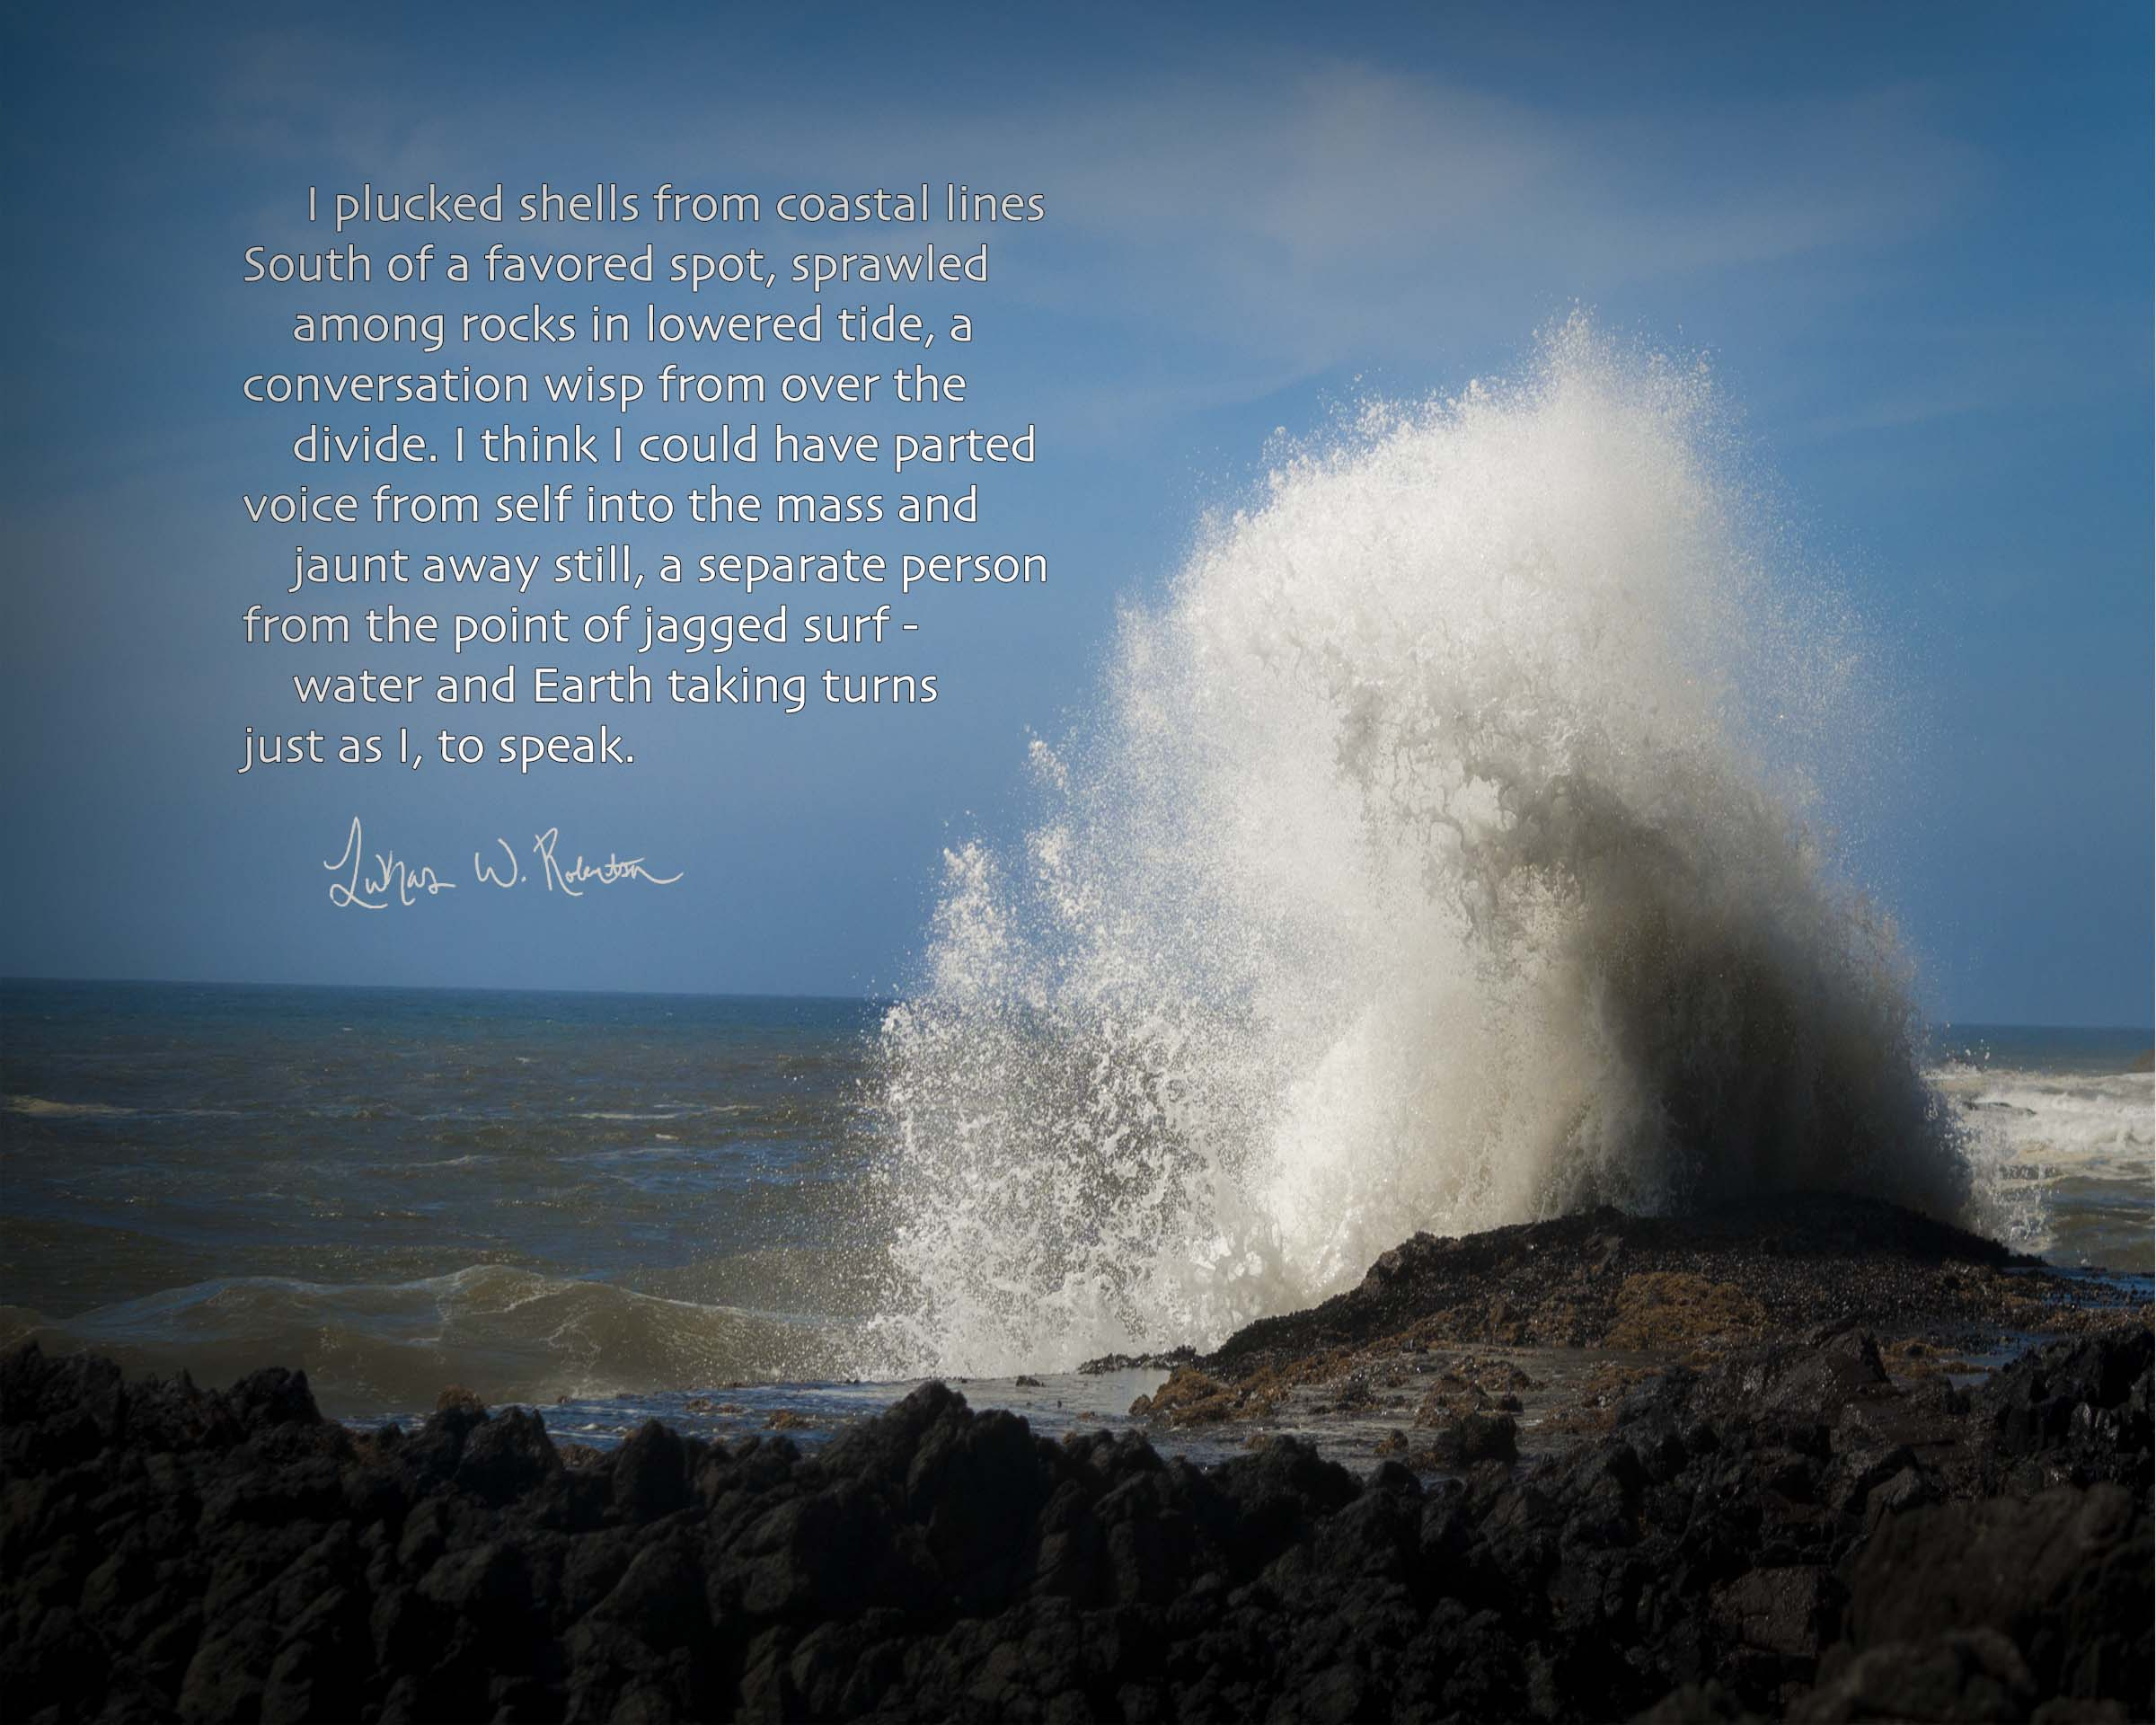 I-Plucked-Shells-From-Coastal-Lines.jpg